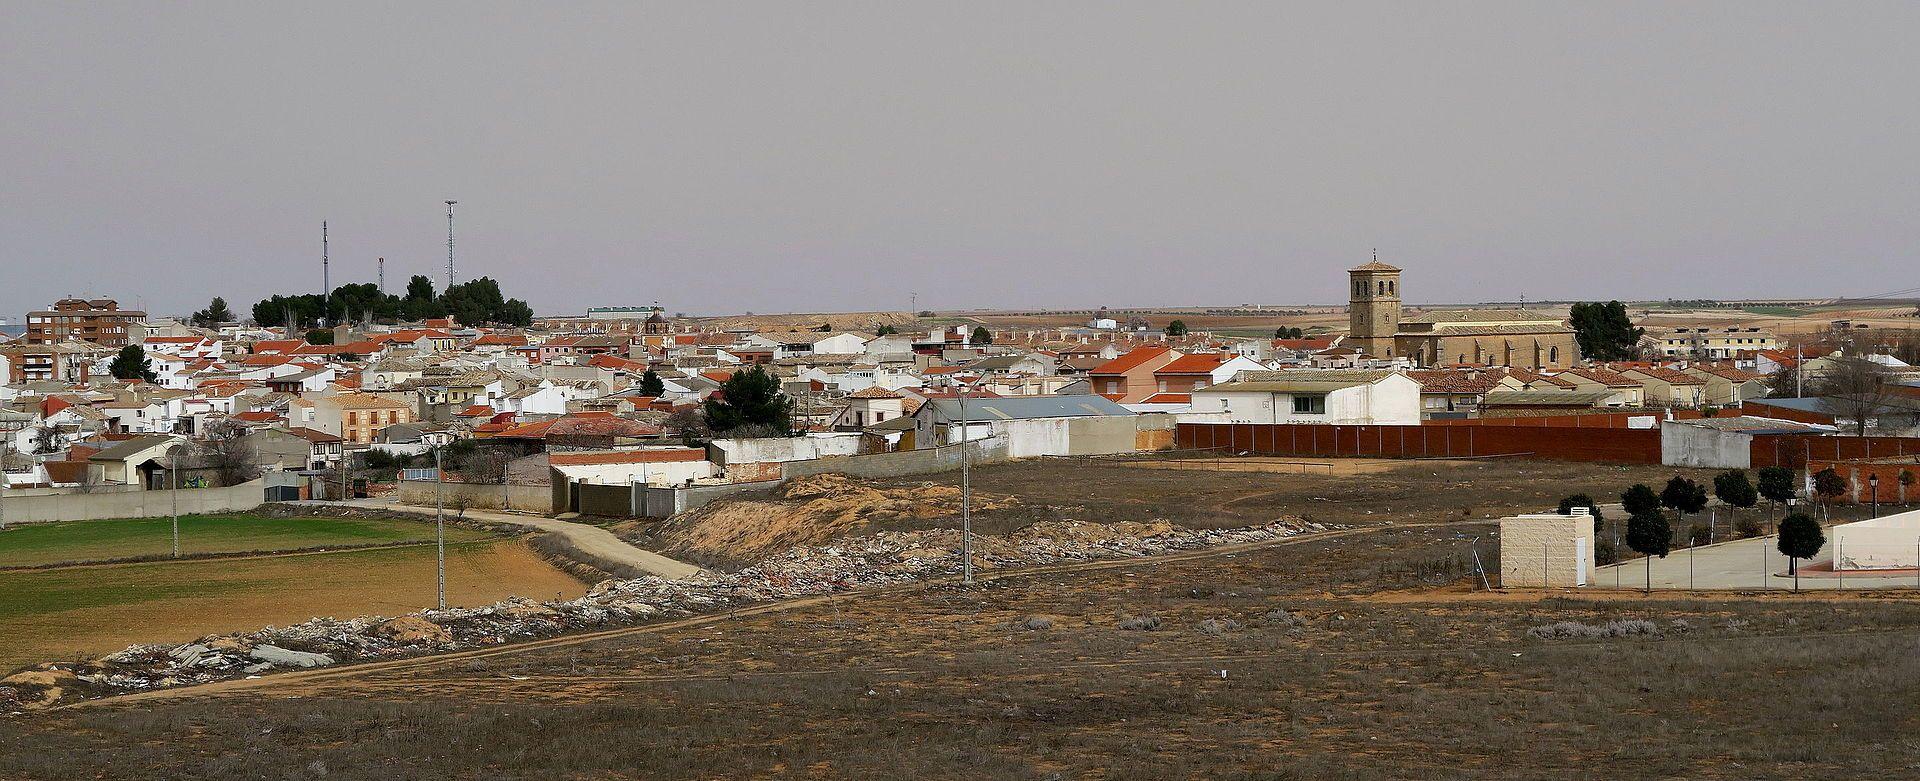 Residencias de ancianos en Villatobas Toledo